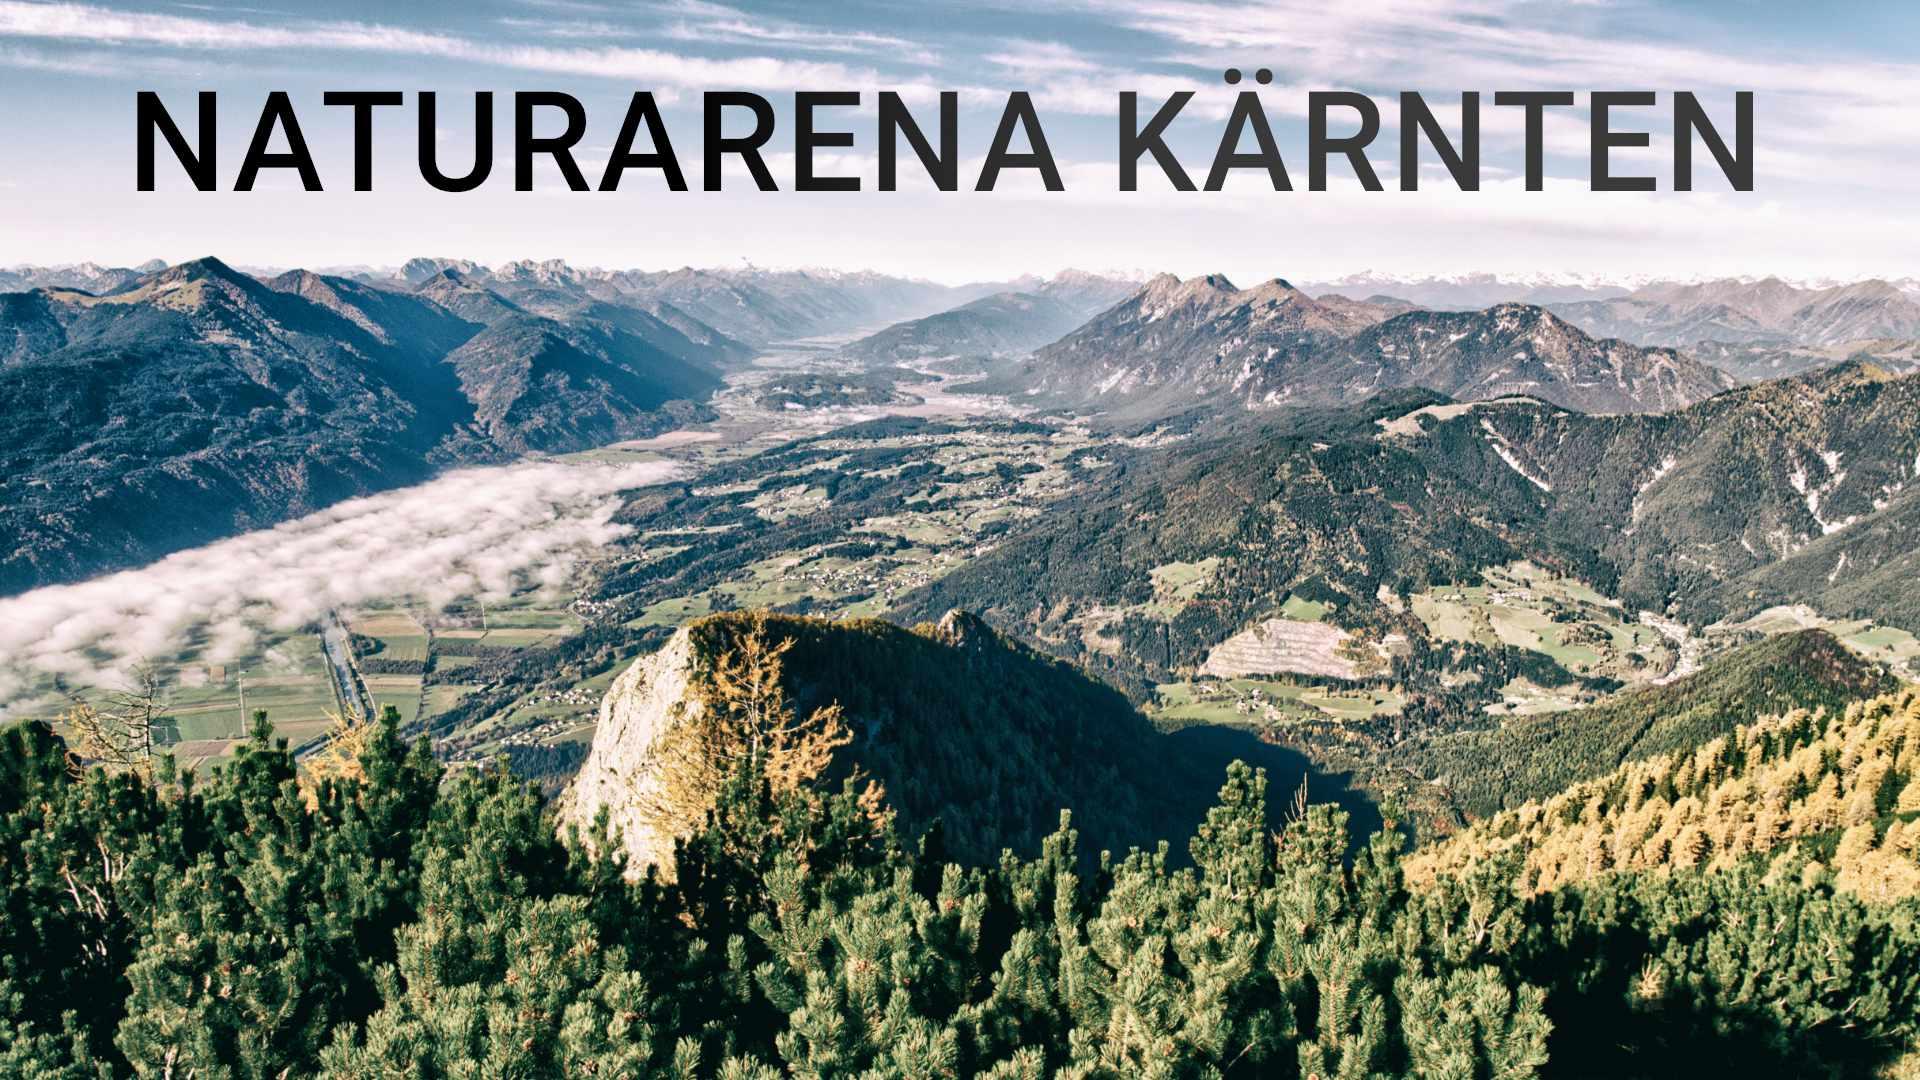 Naturarena Kärnten